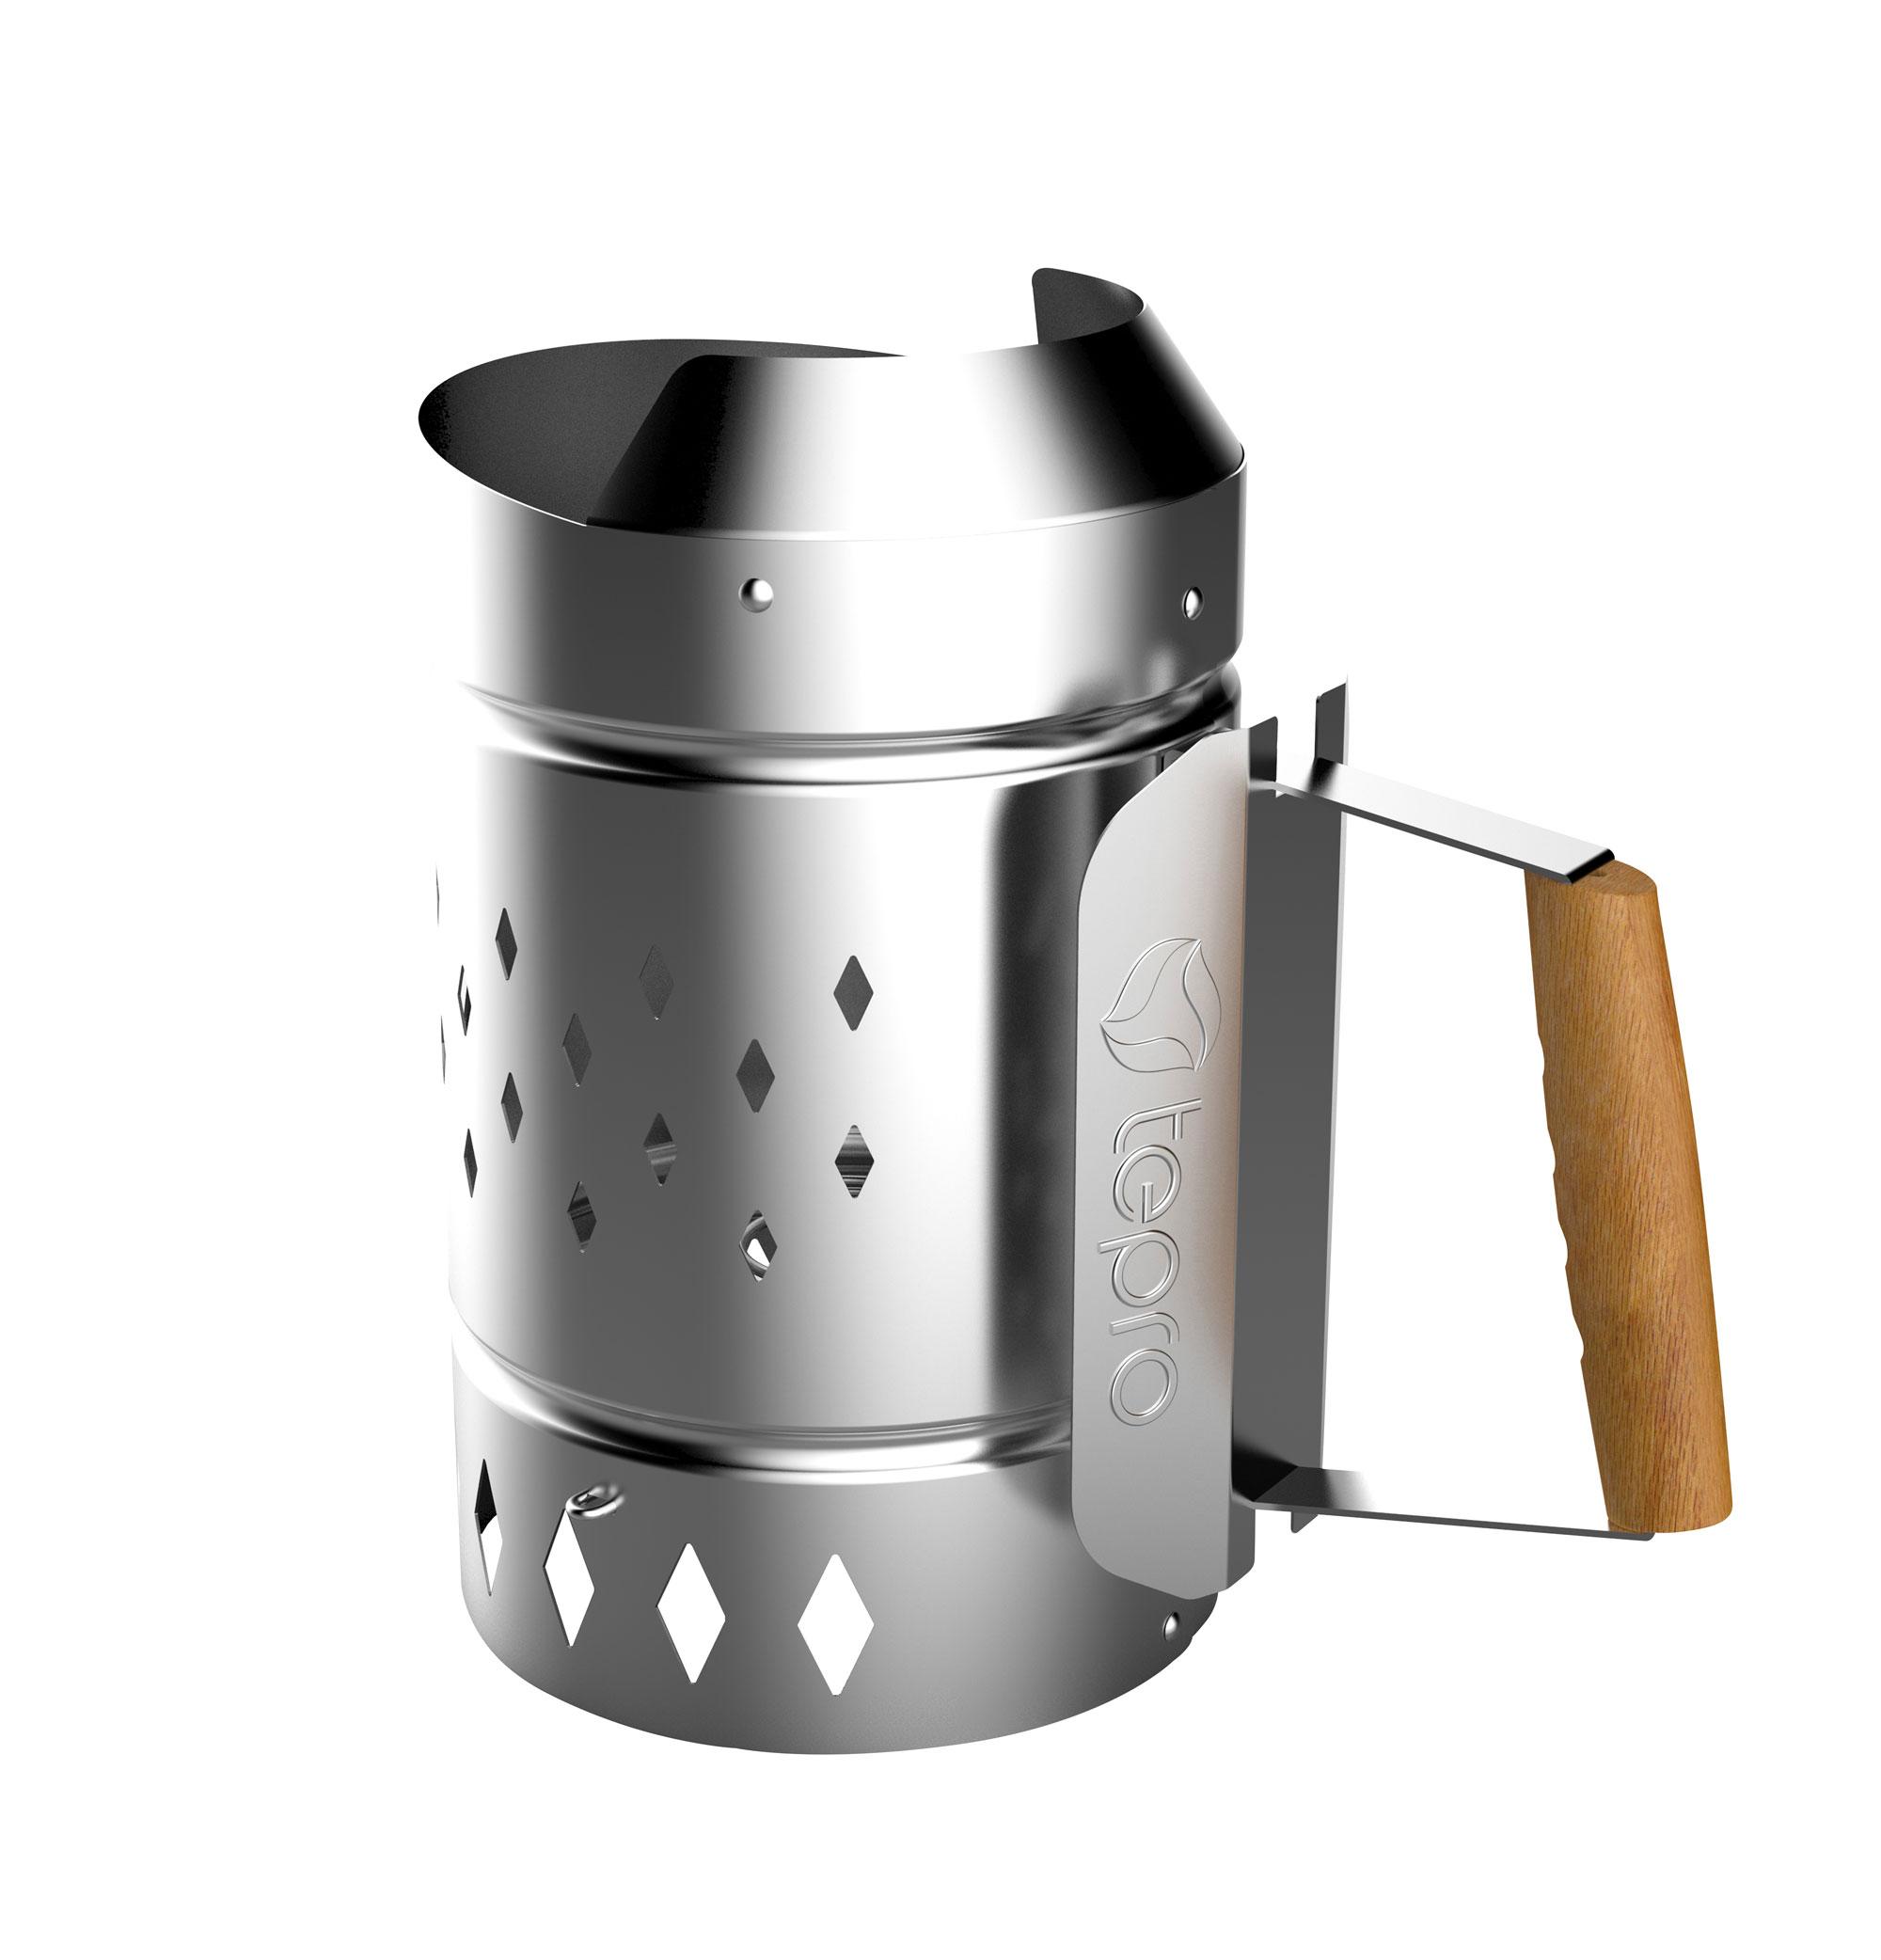 Tepro Anzündkamin XL für Holzkohle Stahl silber Bild 1